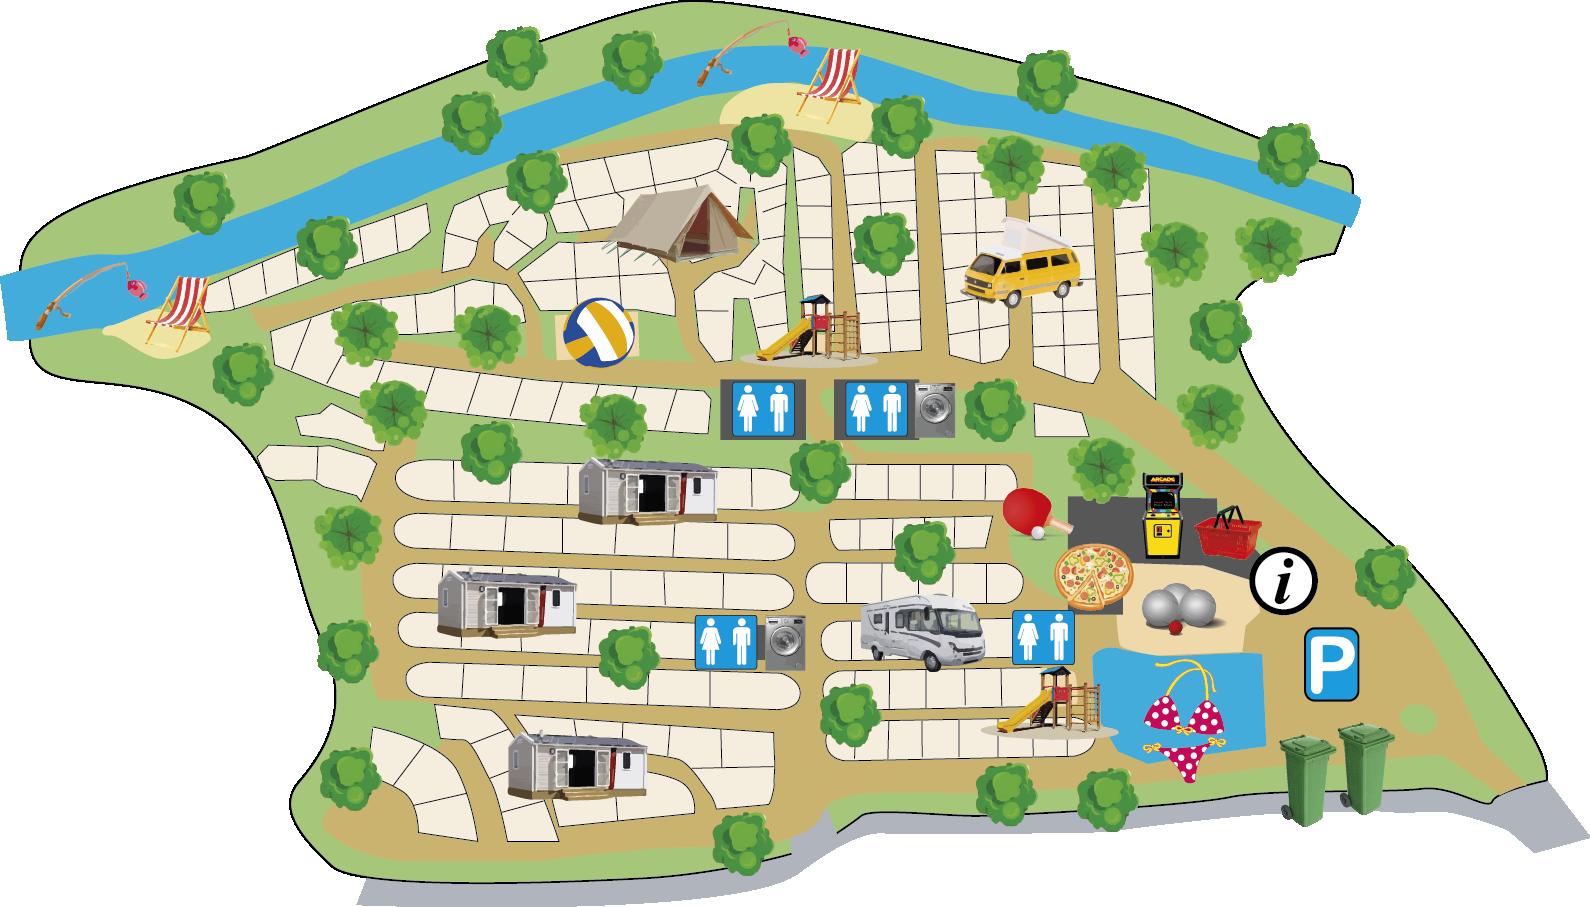 Map of the Ludo campsite